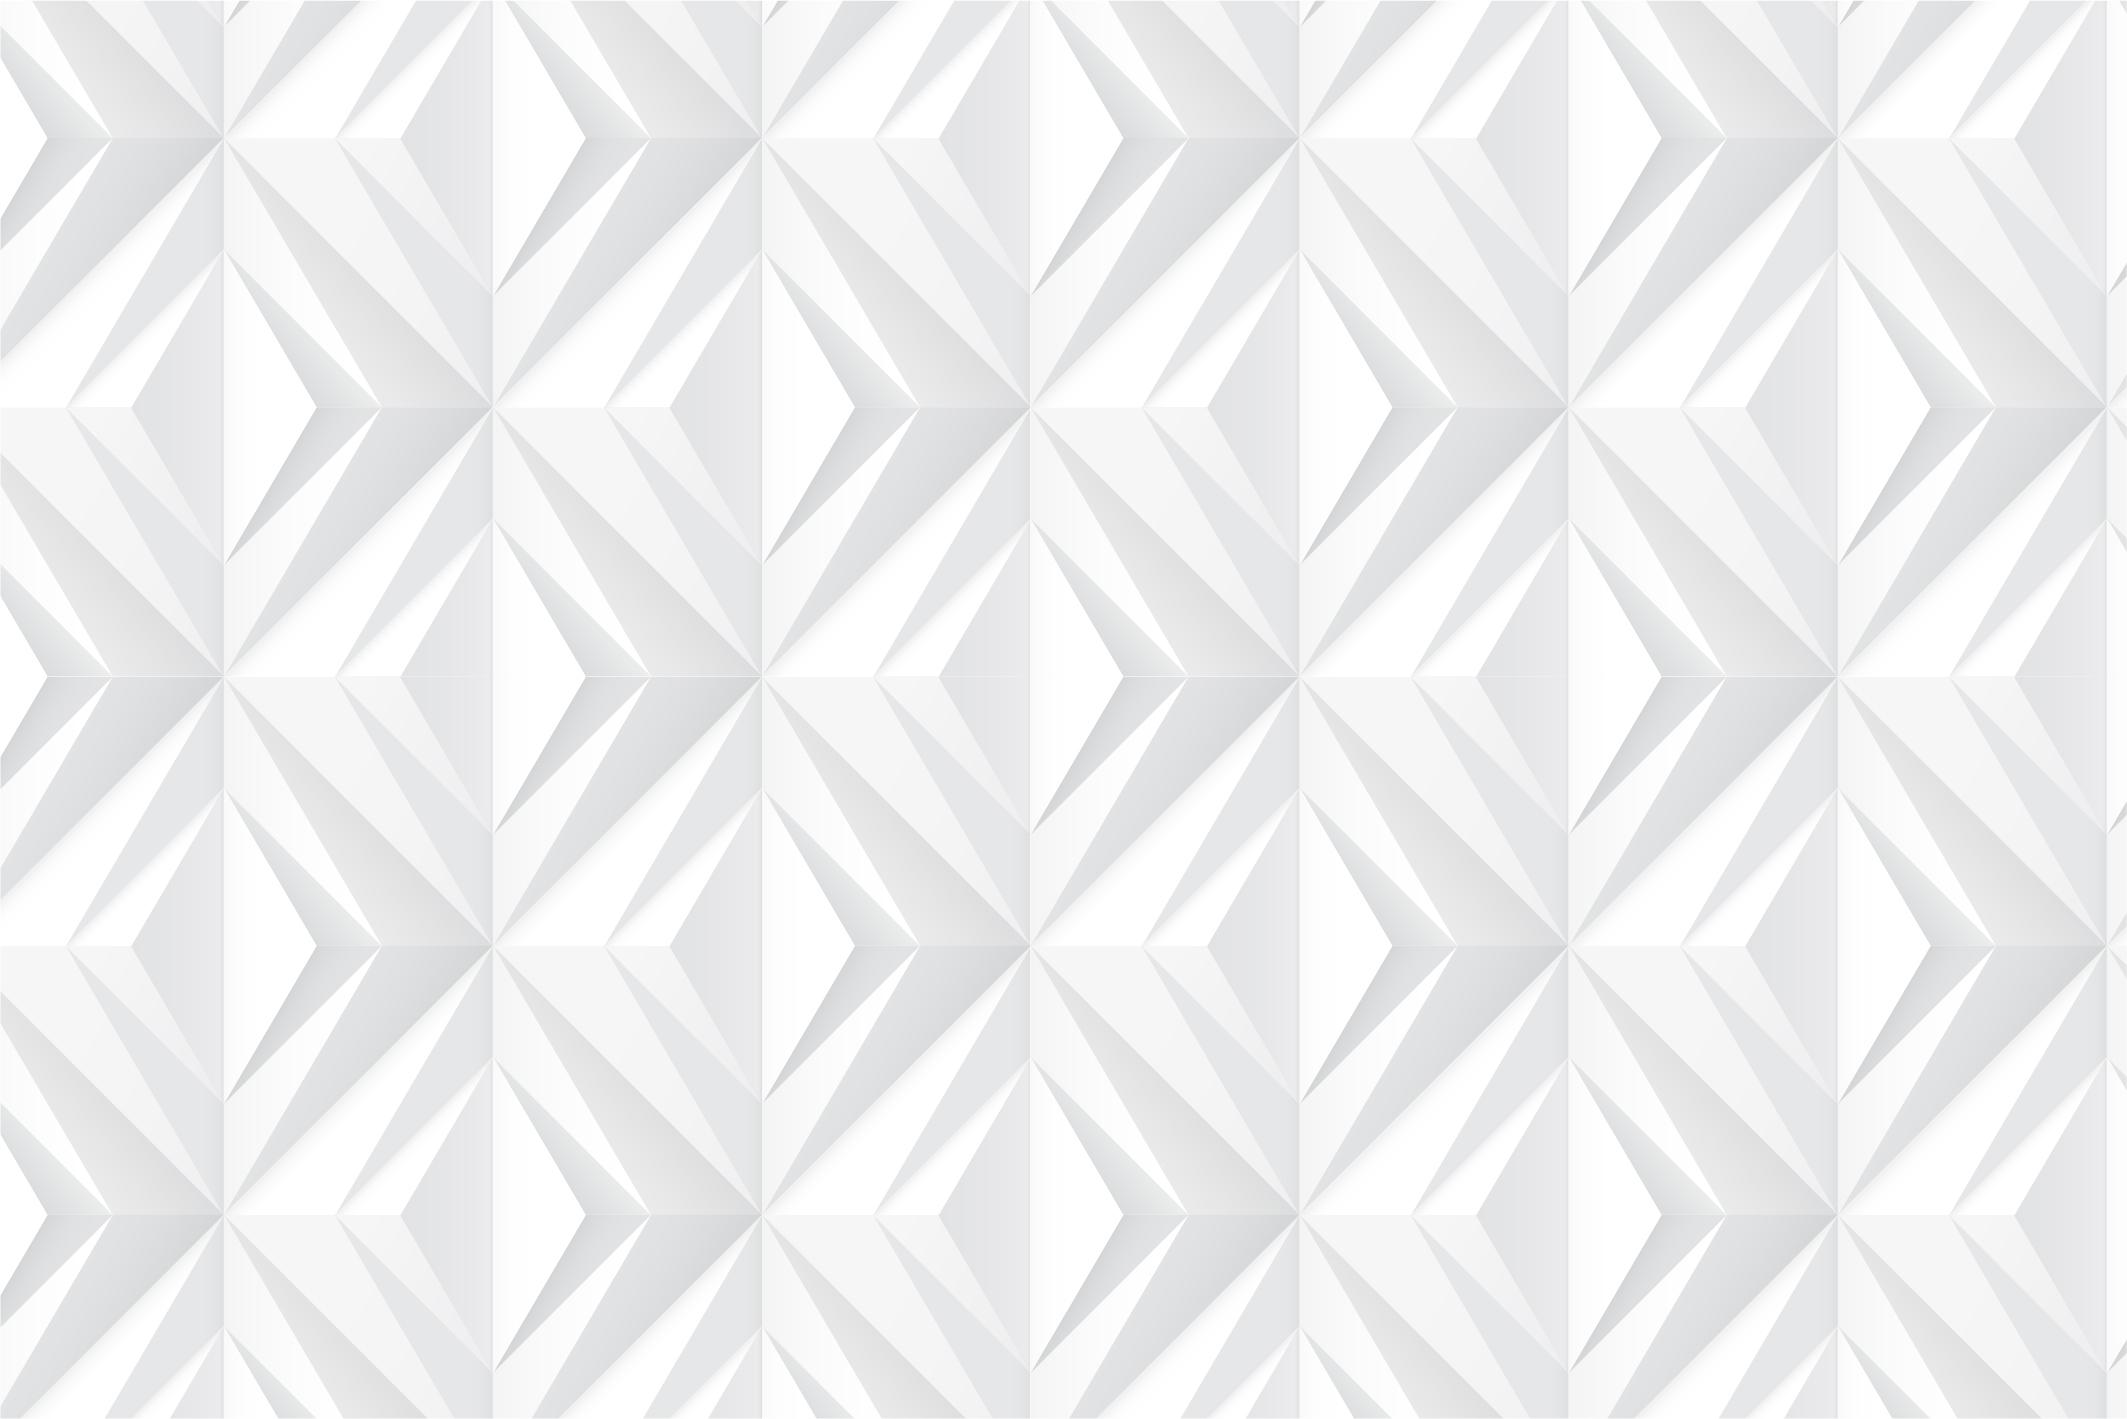 White geometric 3d seamless textures example image 7